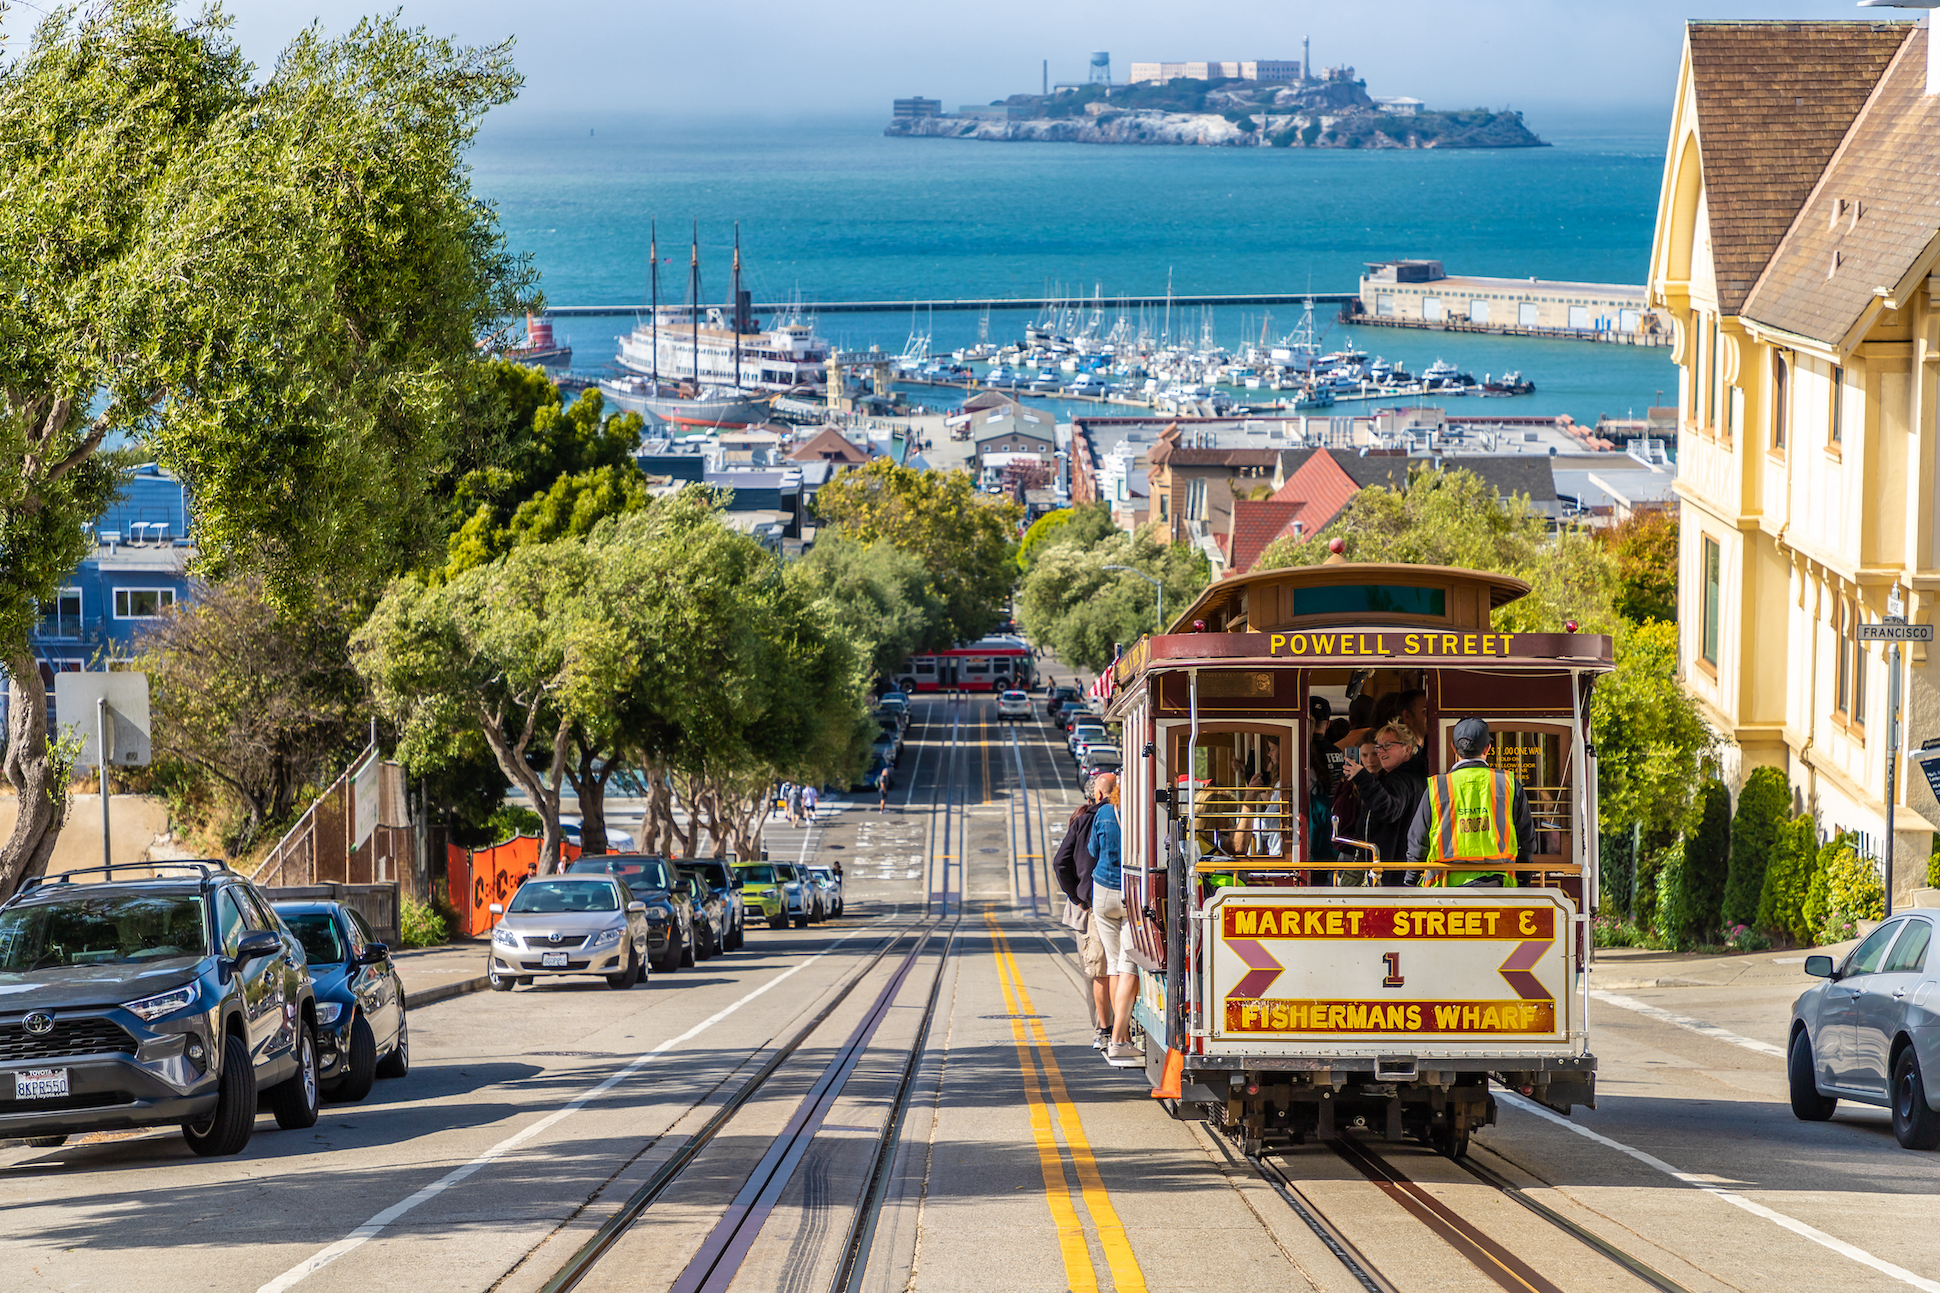 Cable car tram and Alcatraz prison island on a background in San Francisco, California, USA